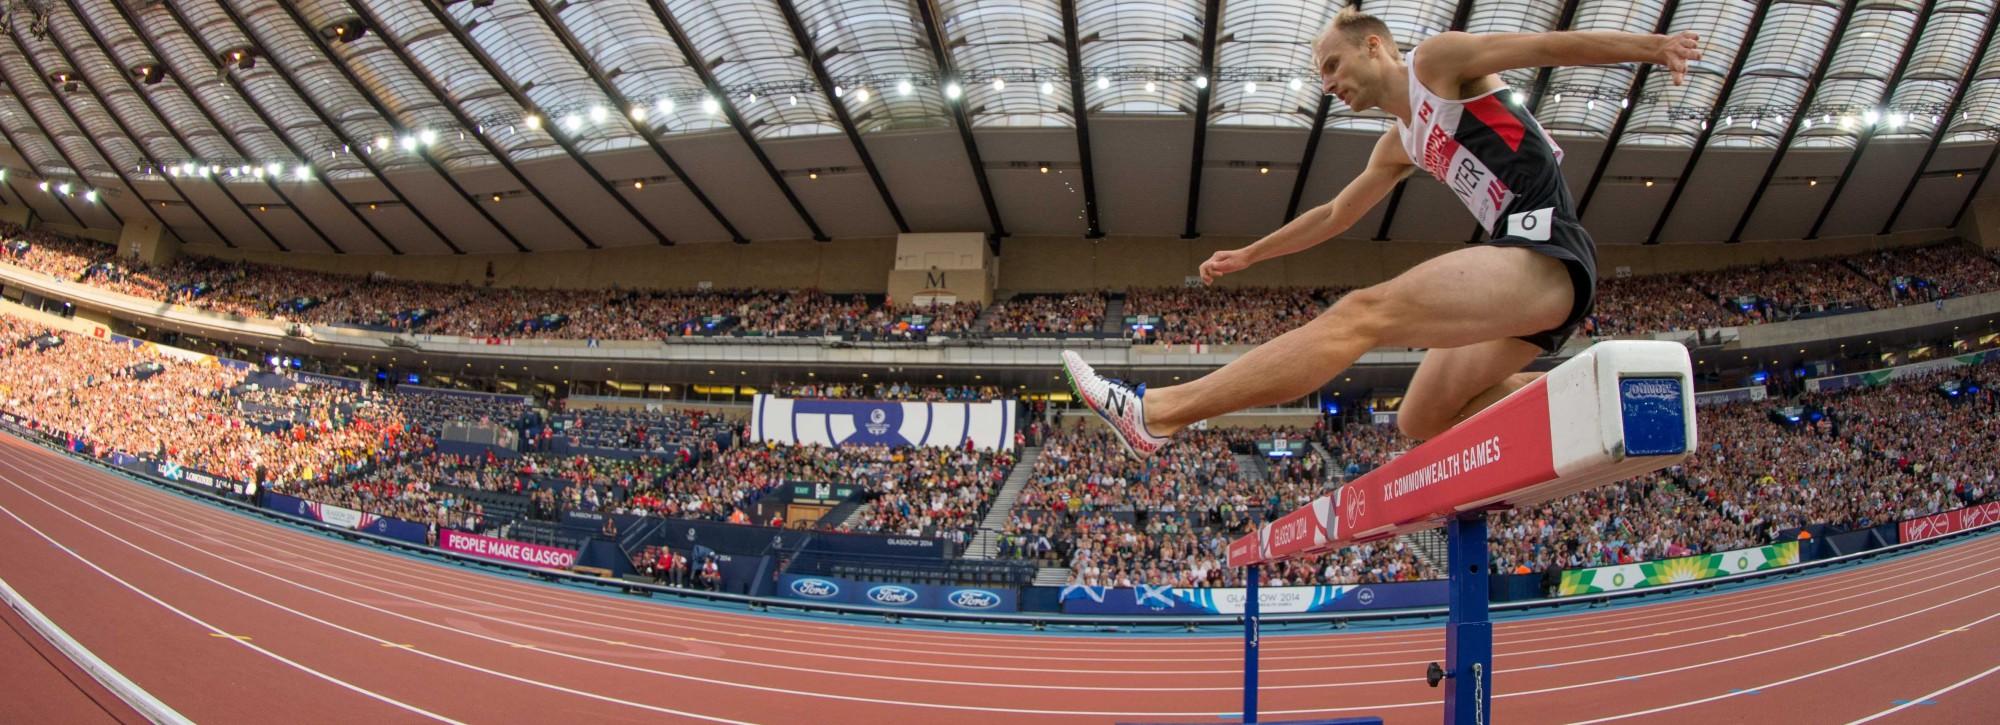 Chasing Rio 2016